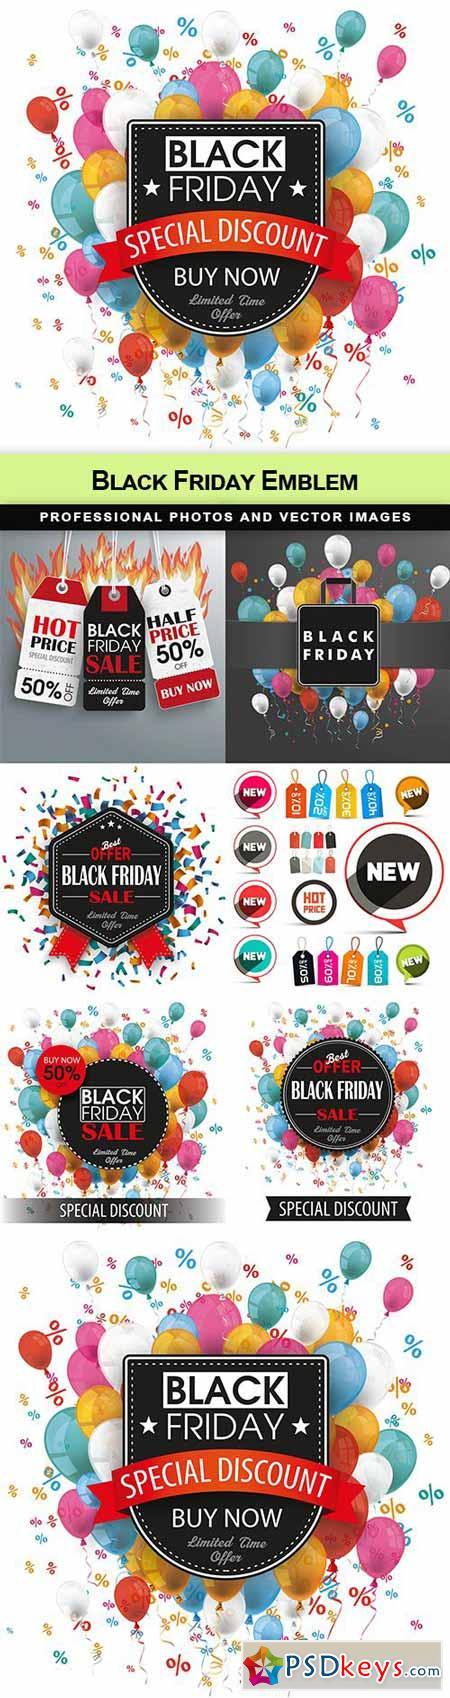 Black Friday Emblem - 7 EPS